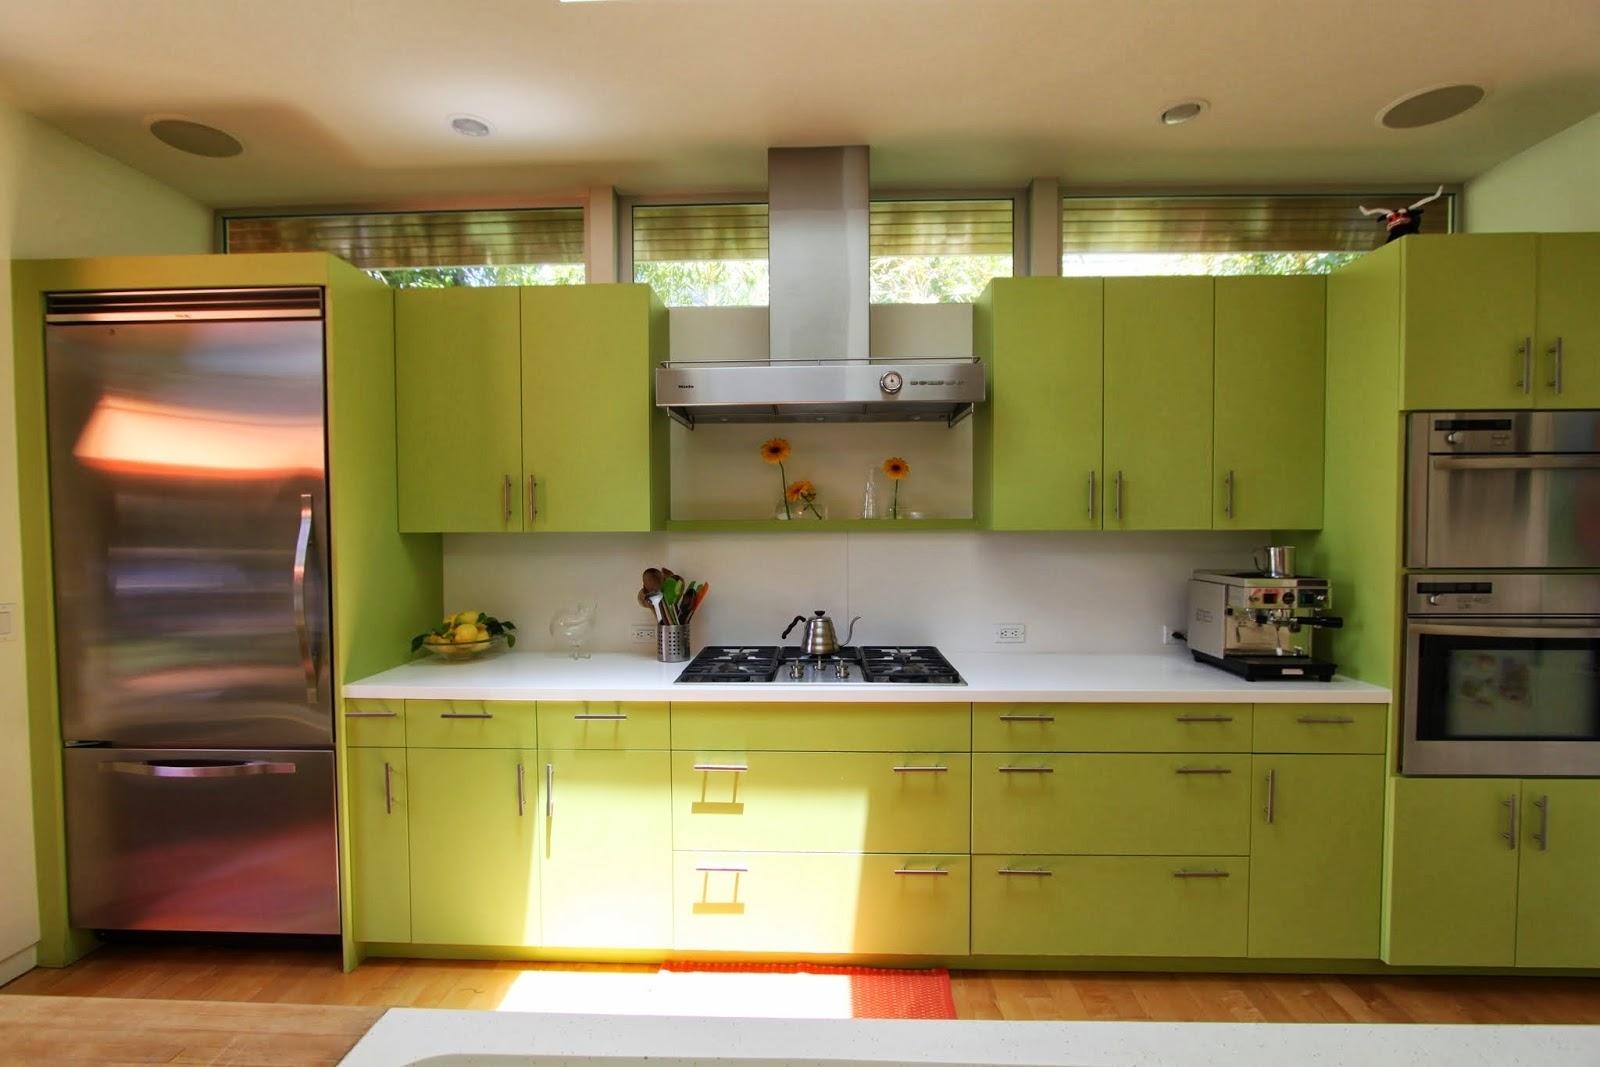 Olive Green Paint For Home Decor – Madison Art Center Design